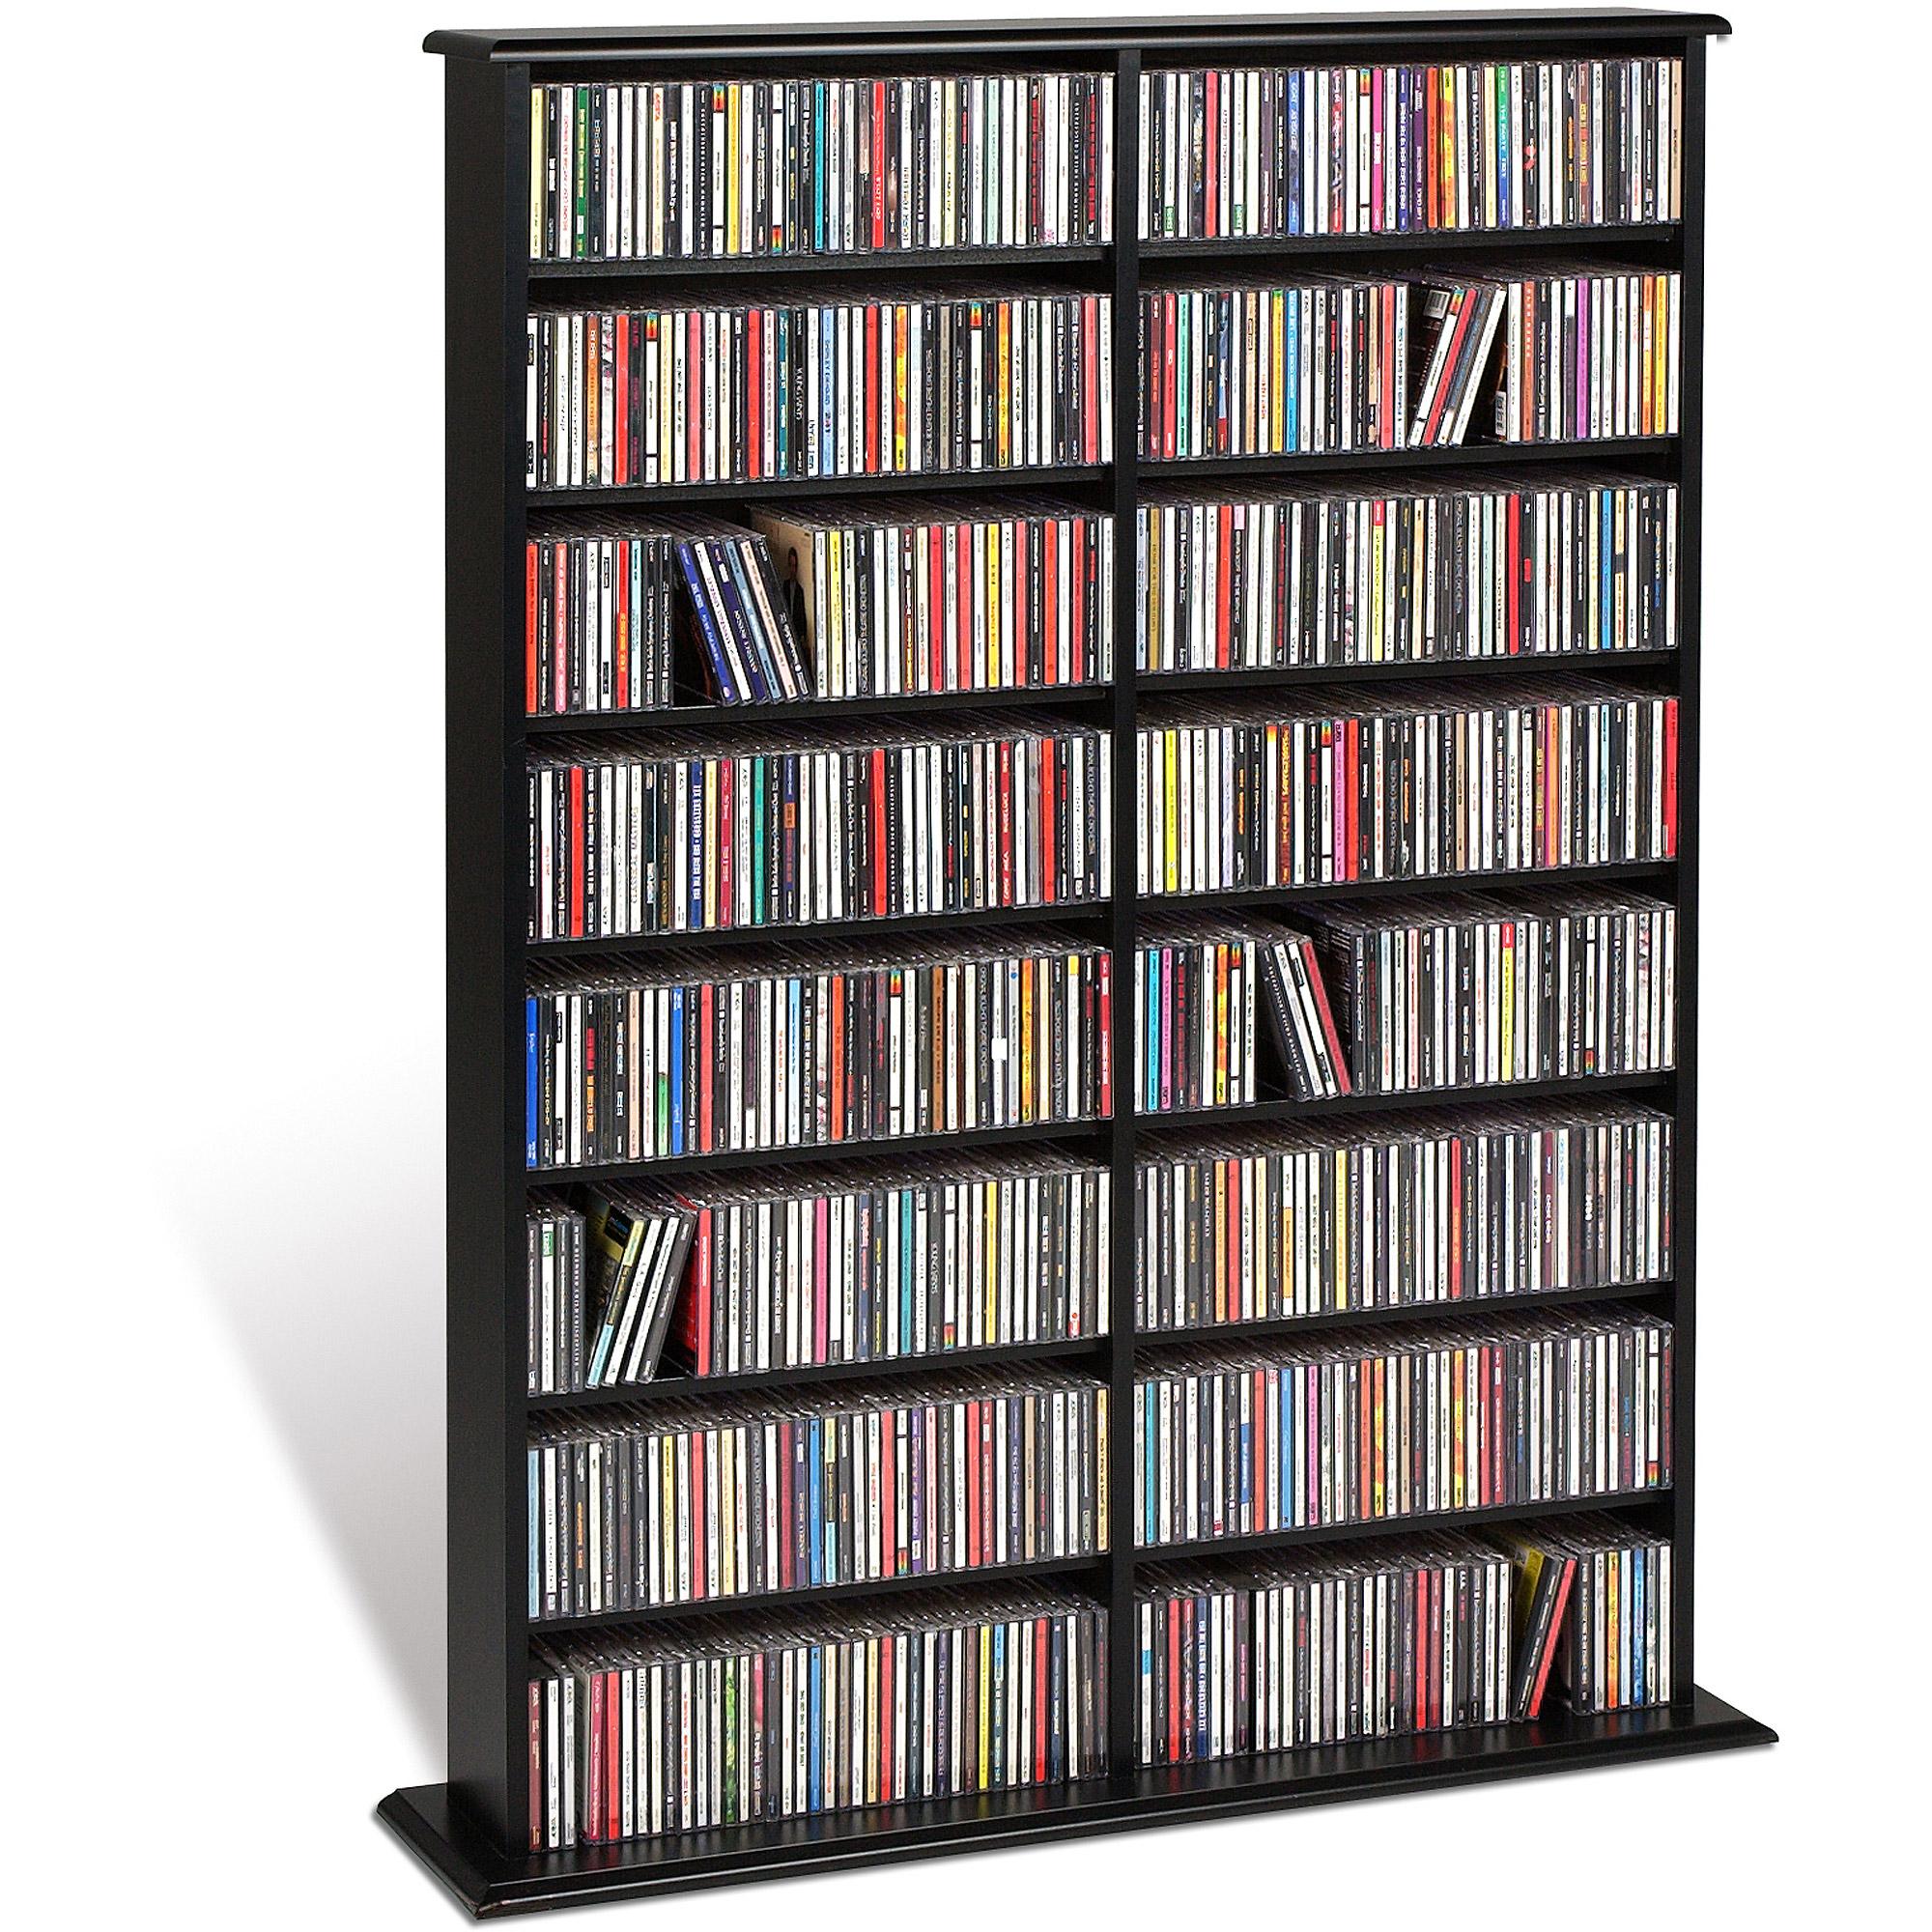 dvd storage prepac double media tower - walmart.com DLKCGLT